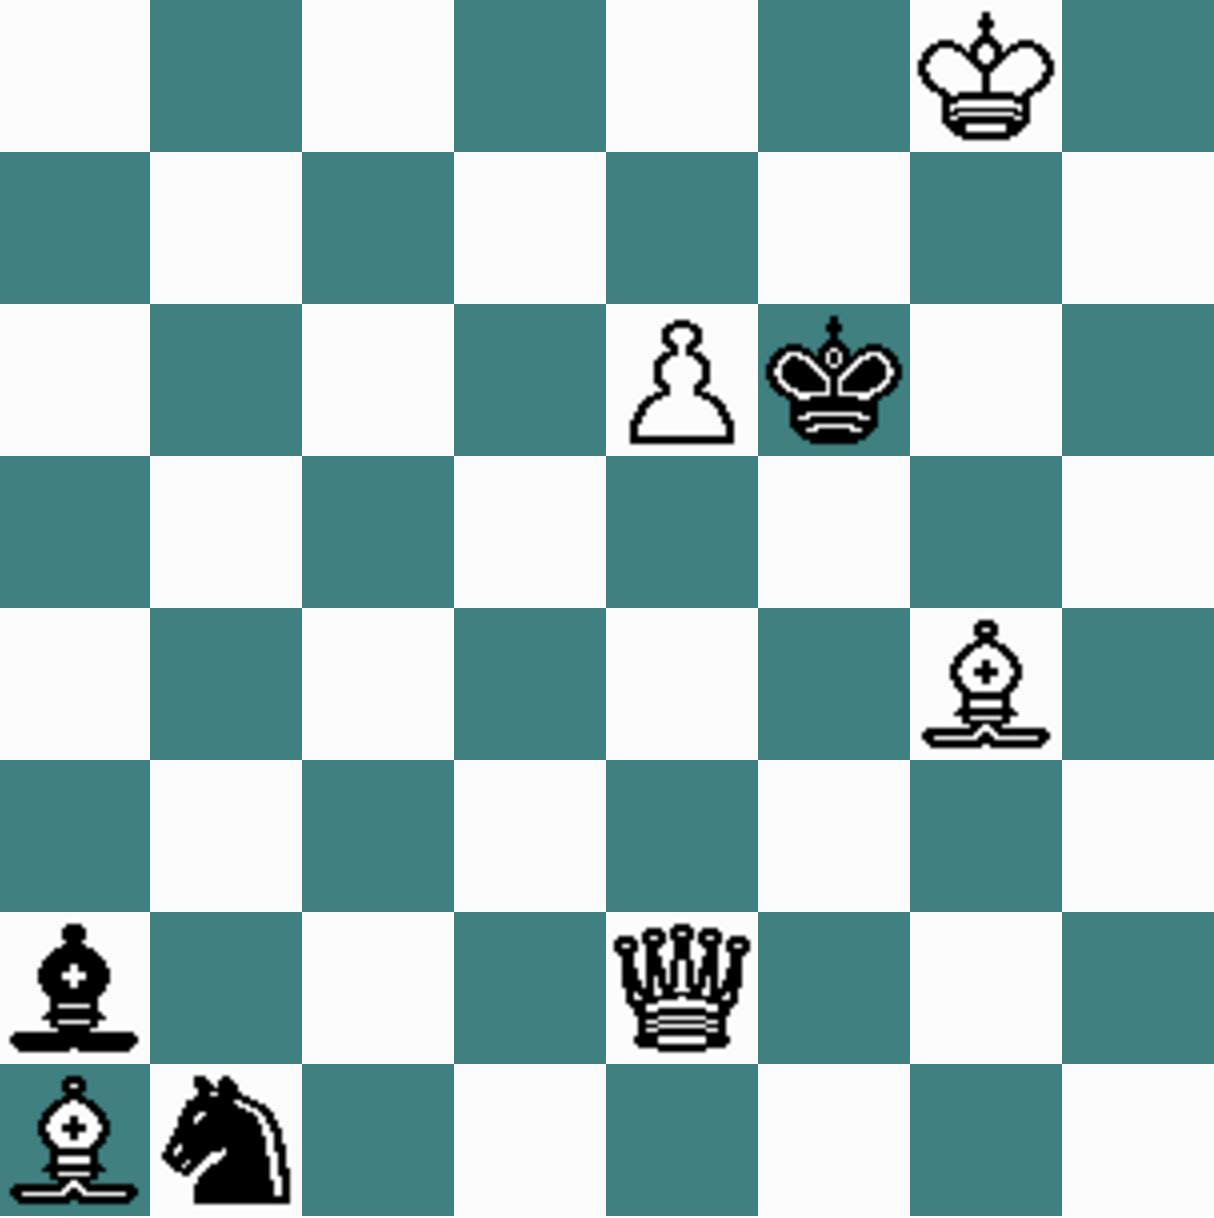 bandelow_chess-problem1